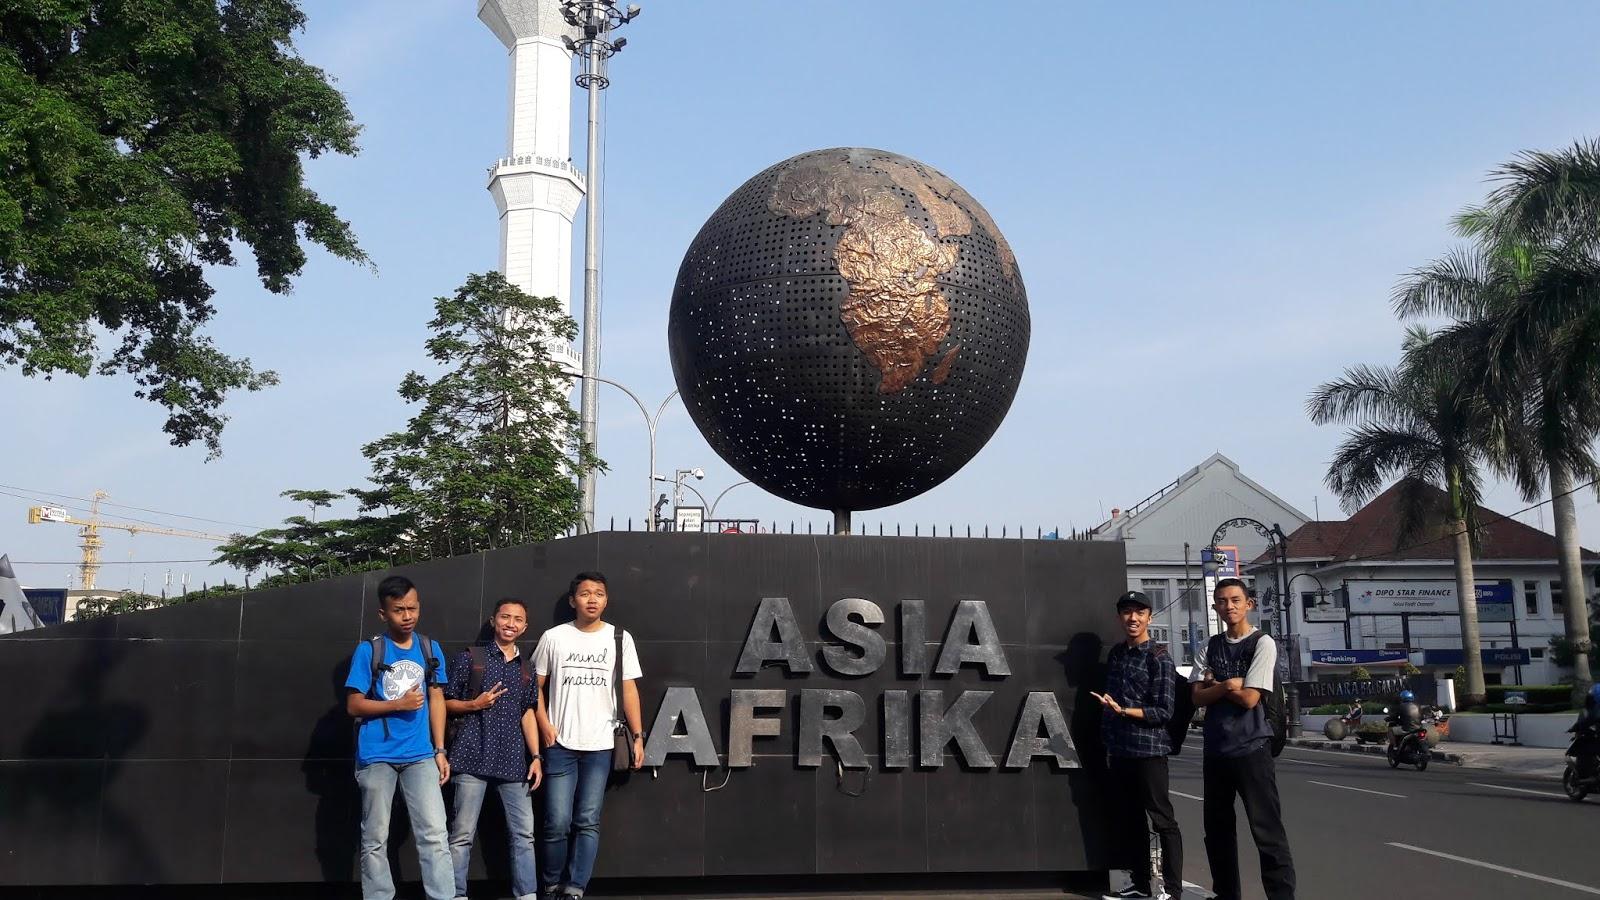 landmark asia afrika